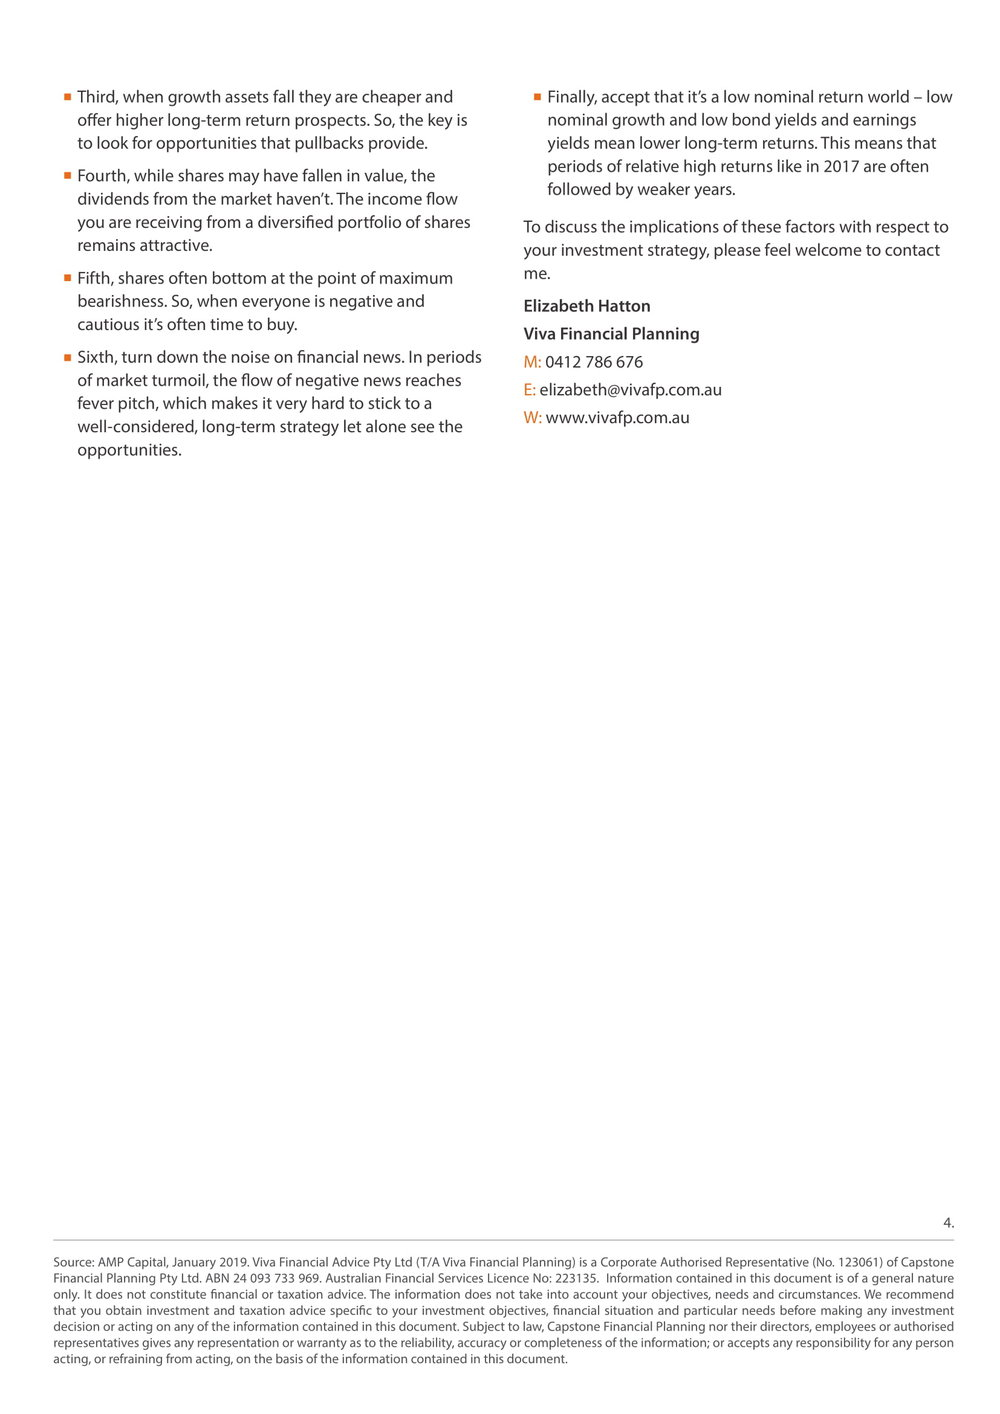 2019 - a list of lists regarding the macro investment outlook_Elizabeth Hatton-4.jpg